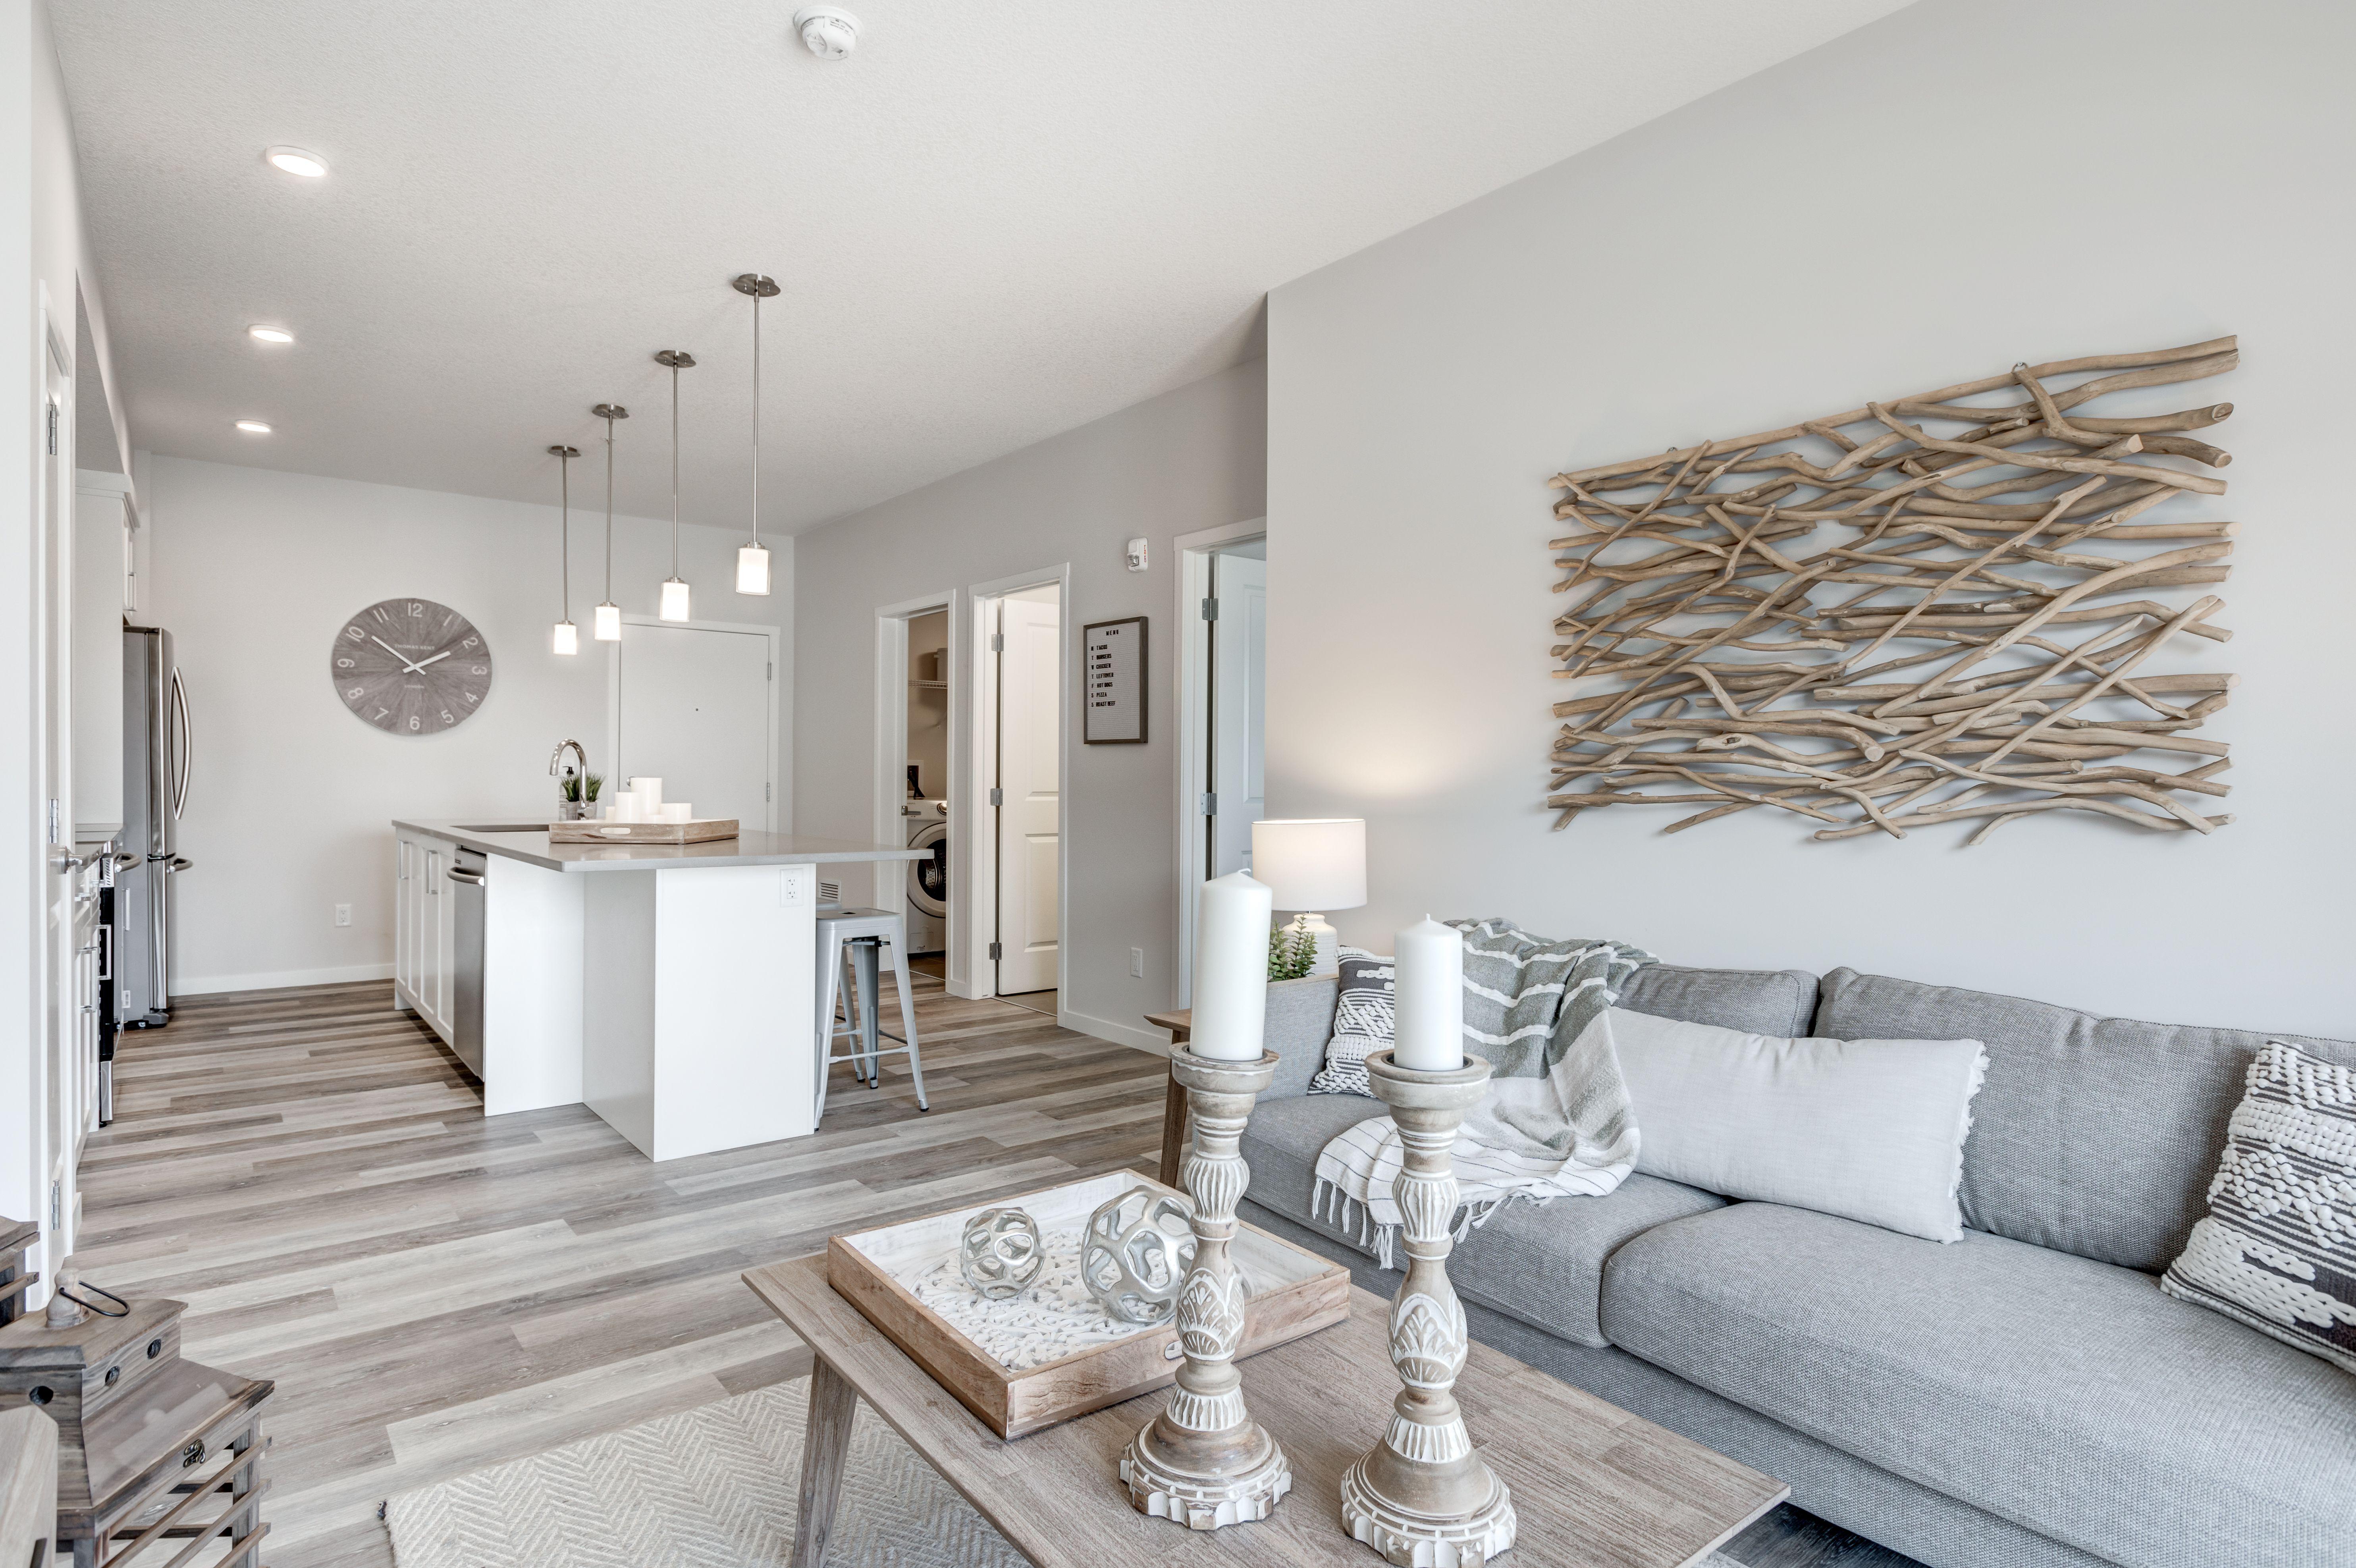 Photo of Neutral farmhouse living room